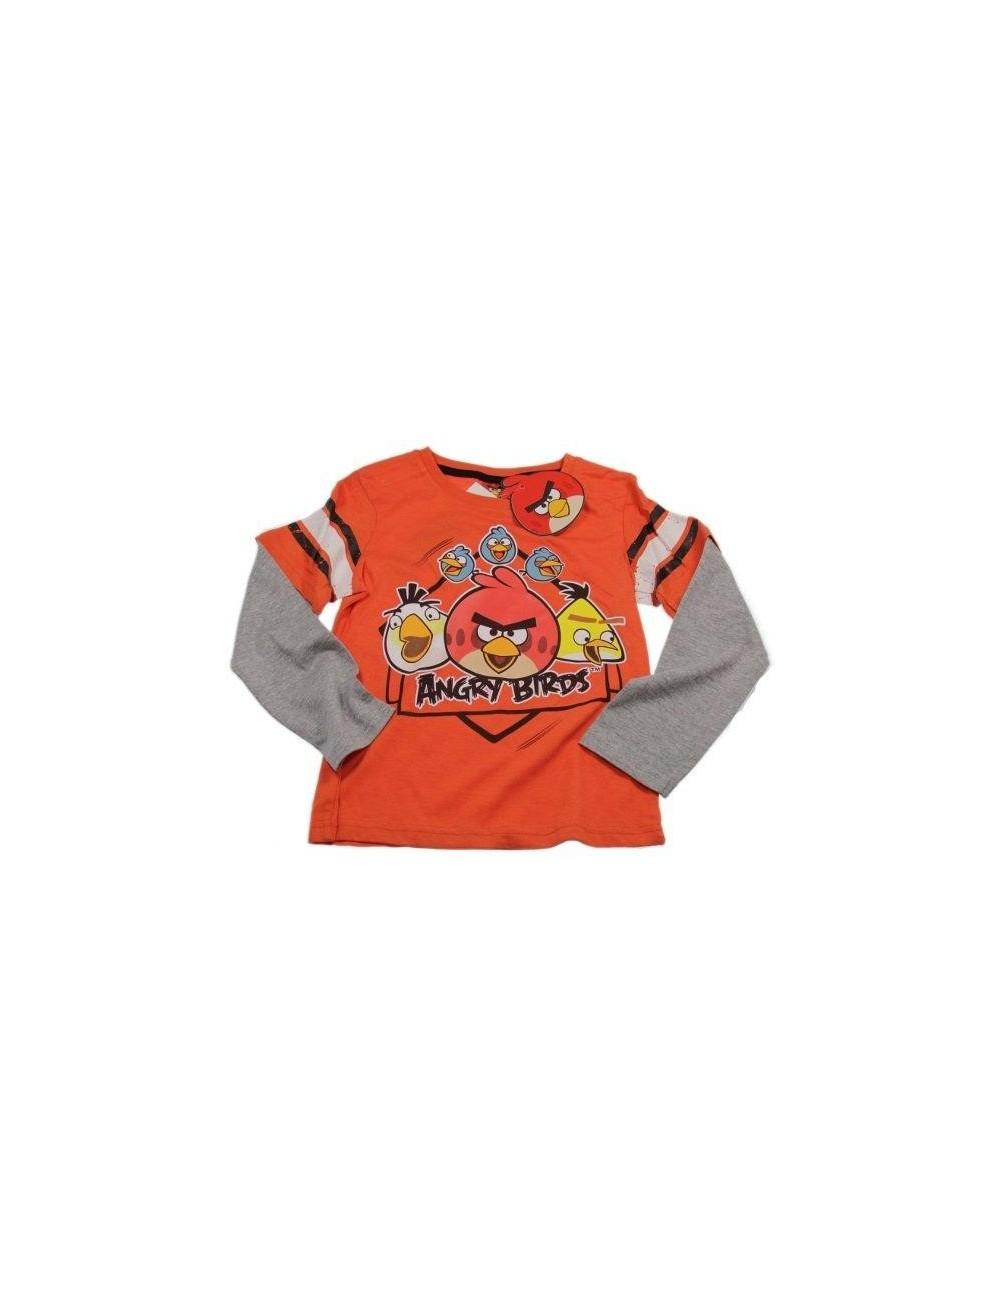 Bluza Angry Birds, portocalie, pentru copii 6 - 8 ani